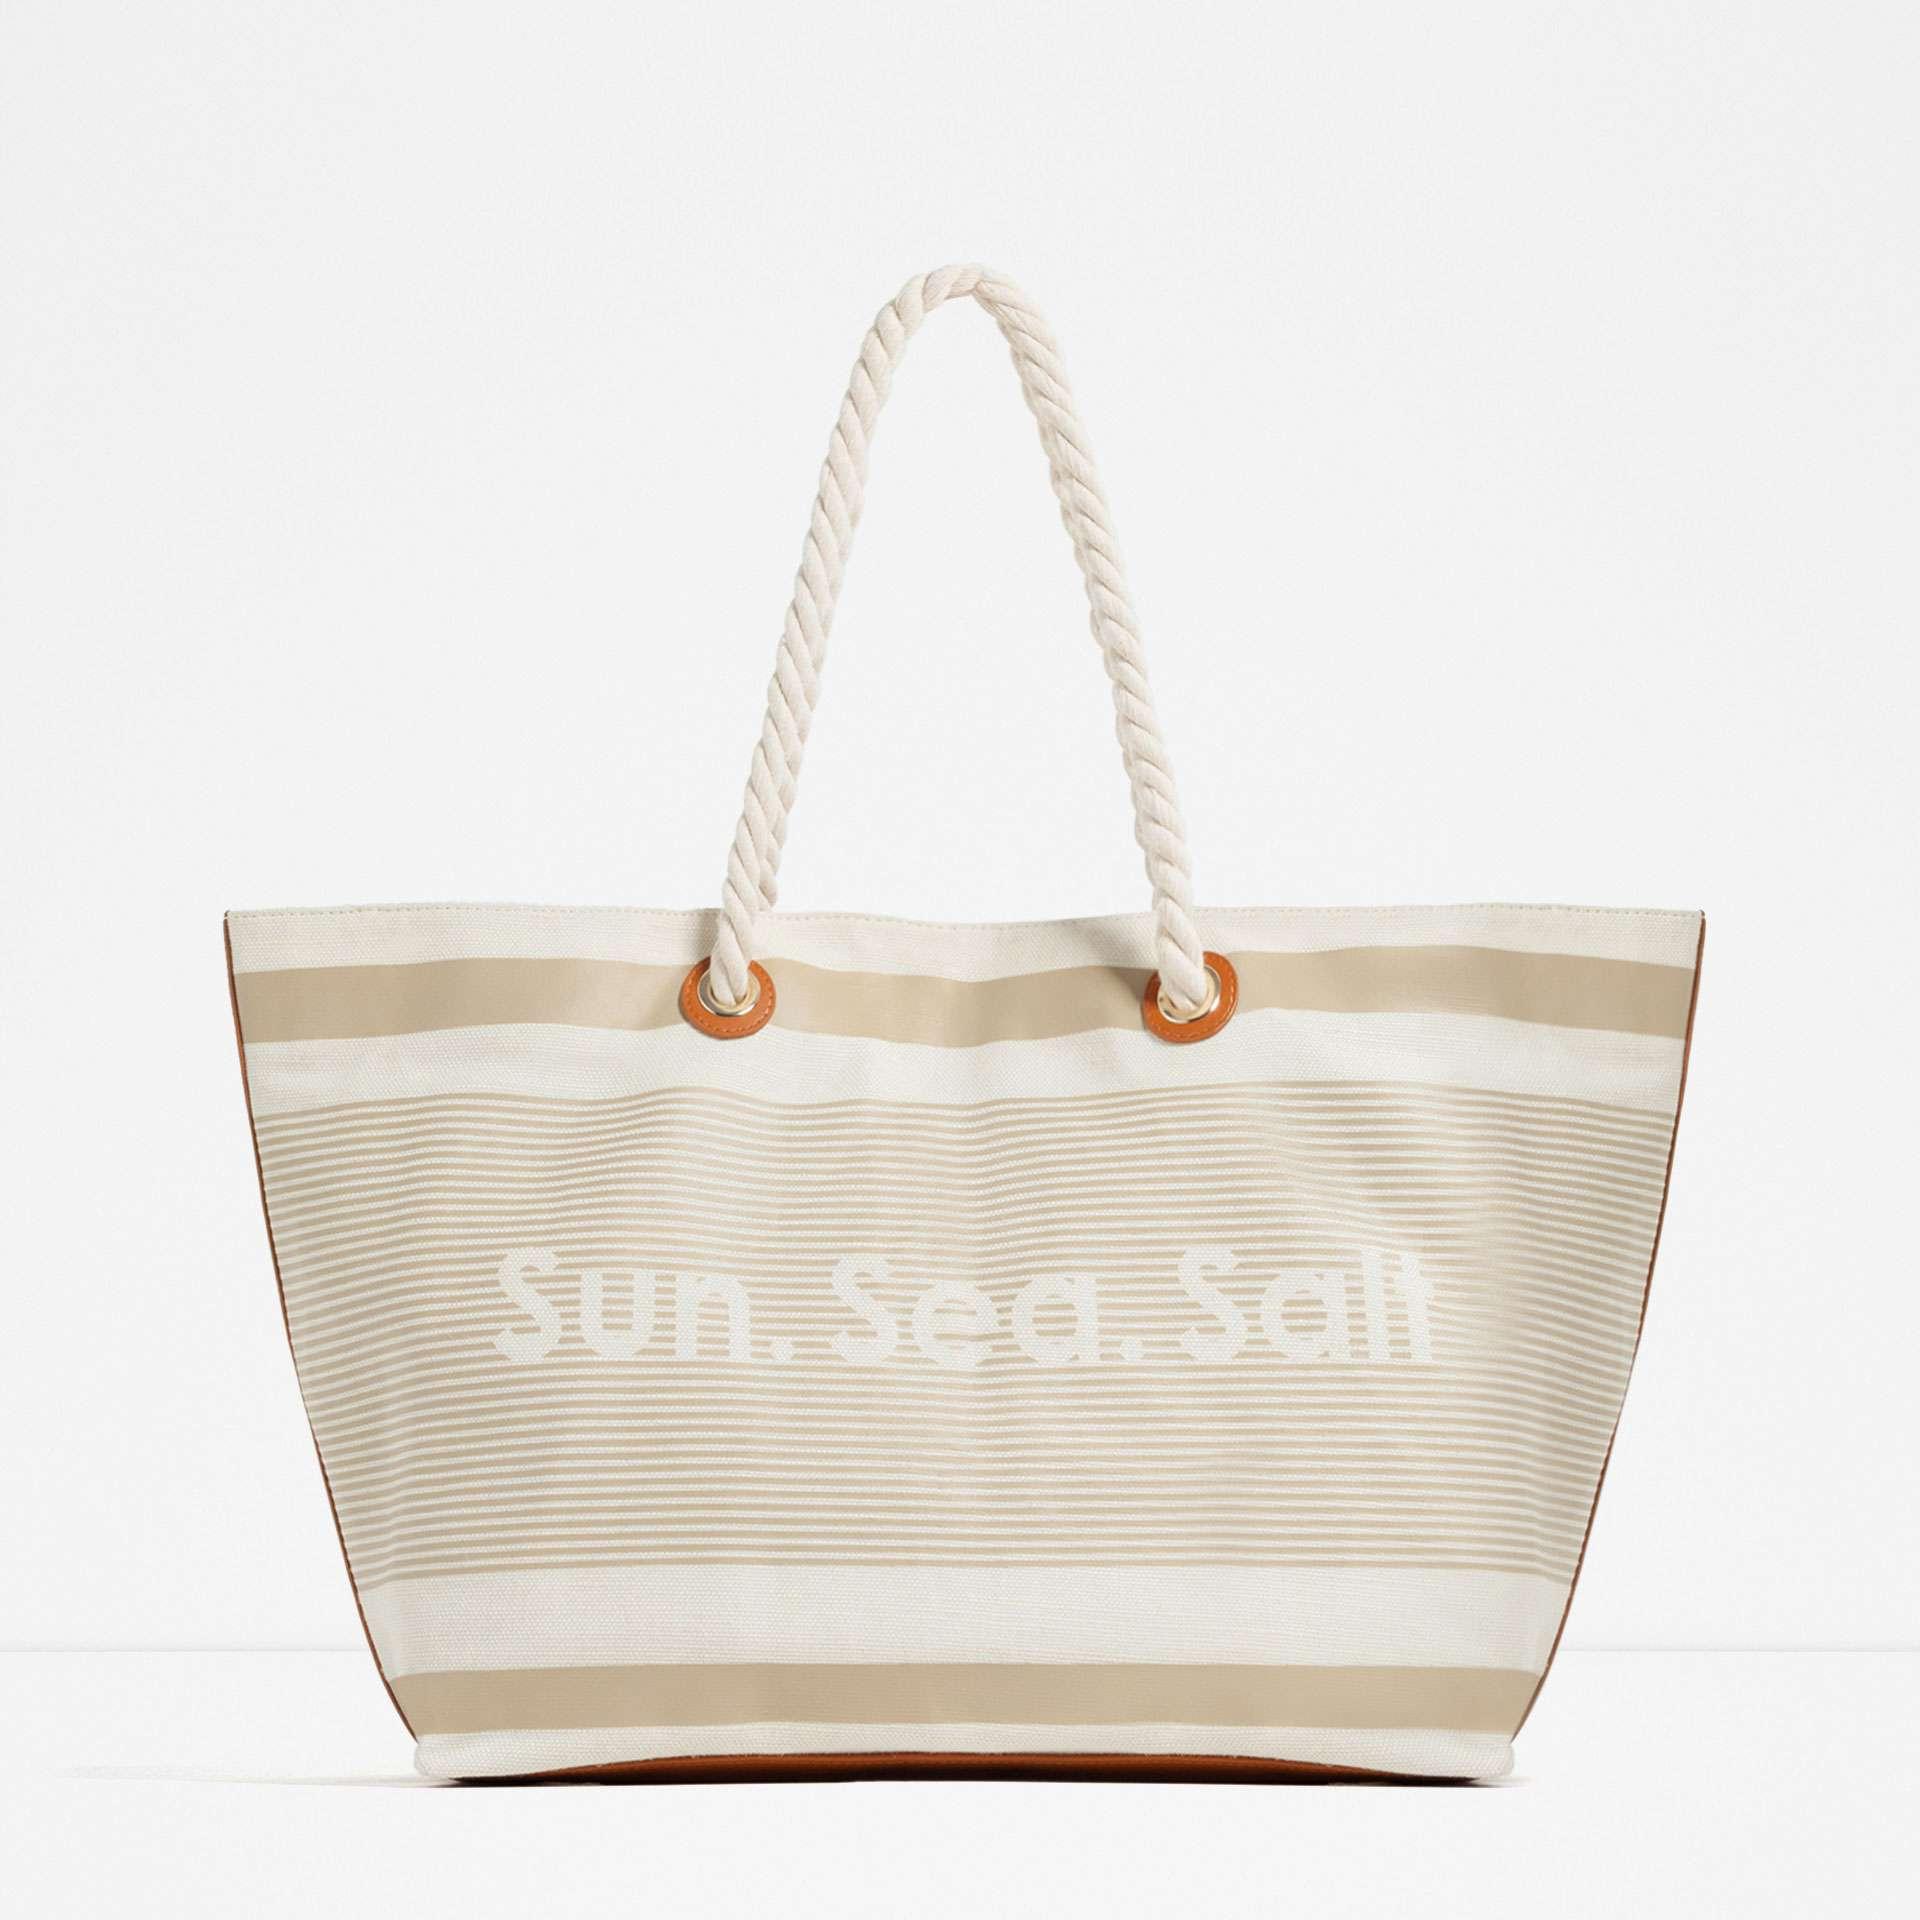 bolsas de playa 2016 - zara 3